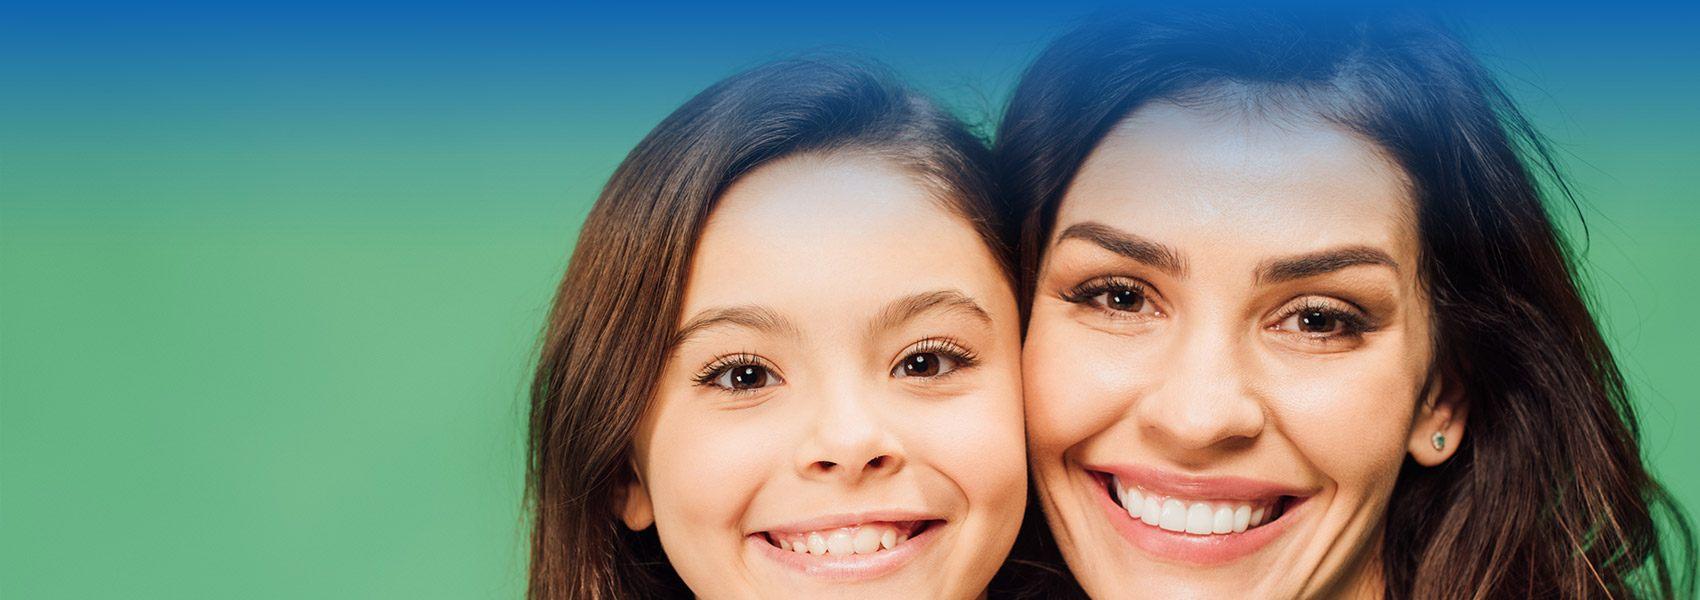 Royal Dental Practice - Blog